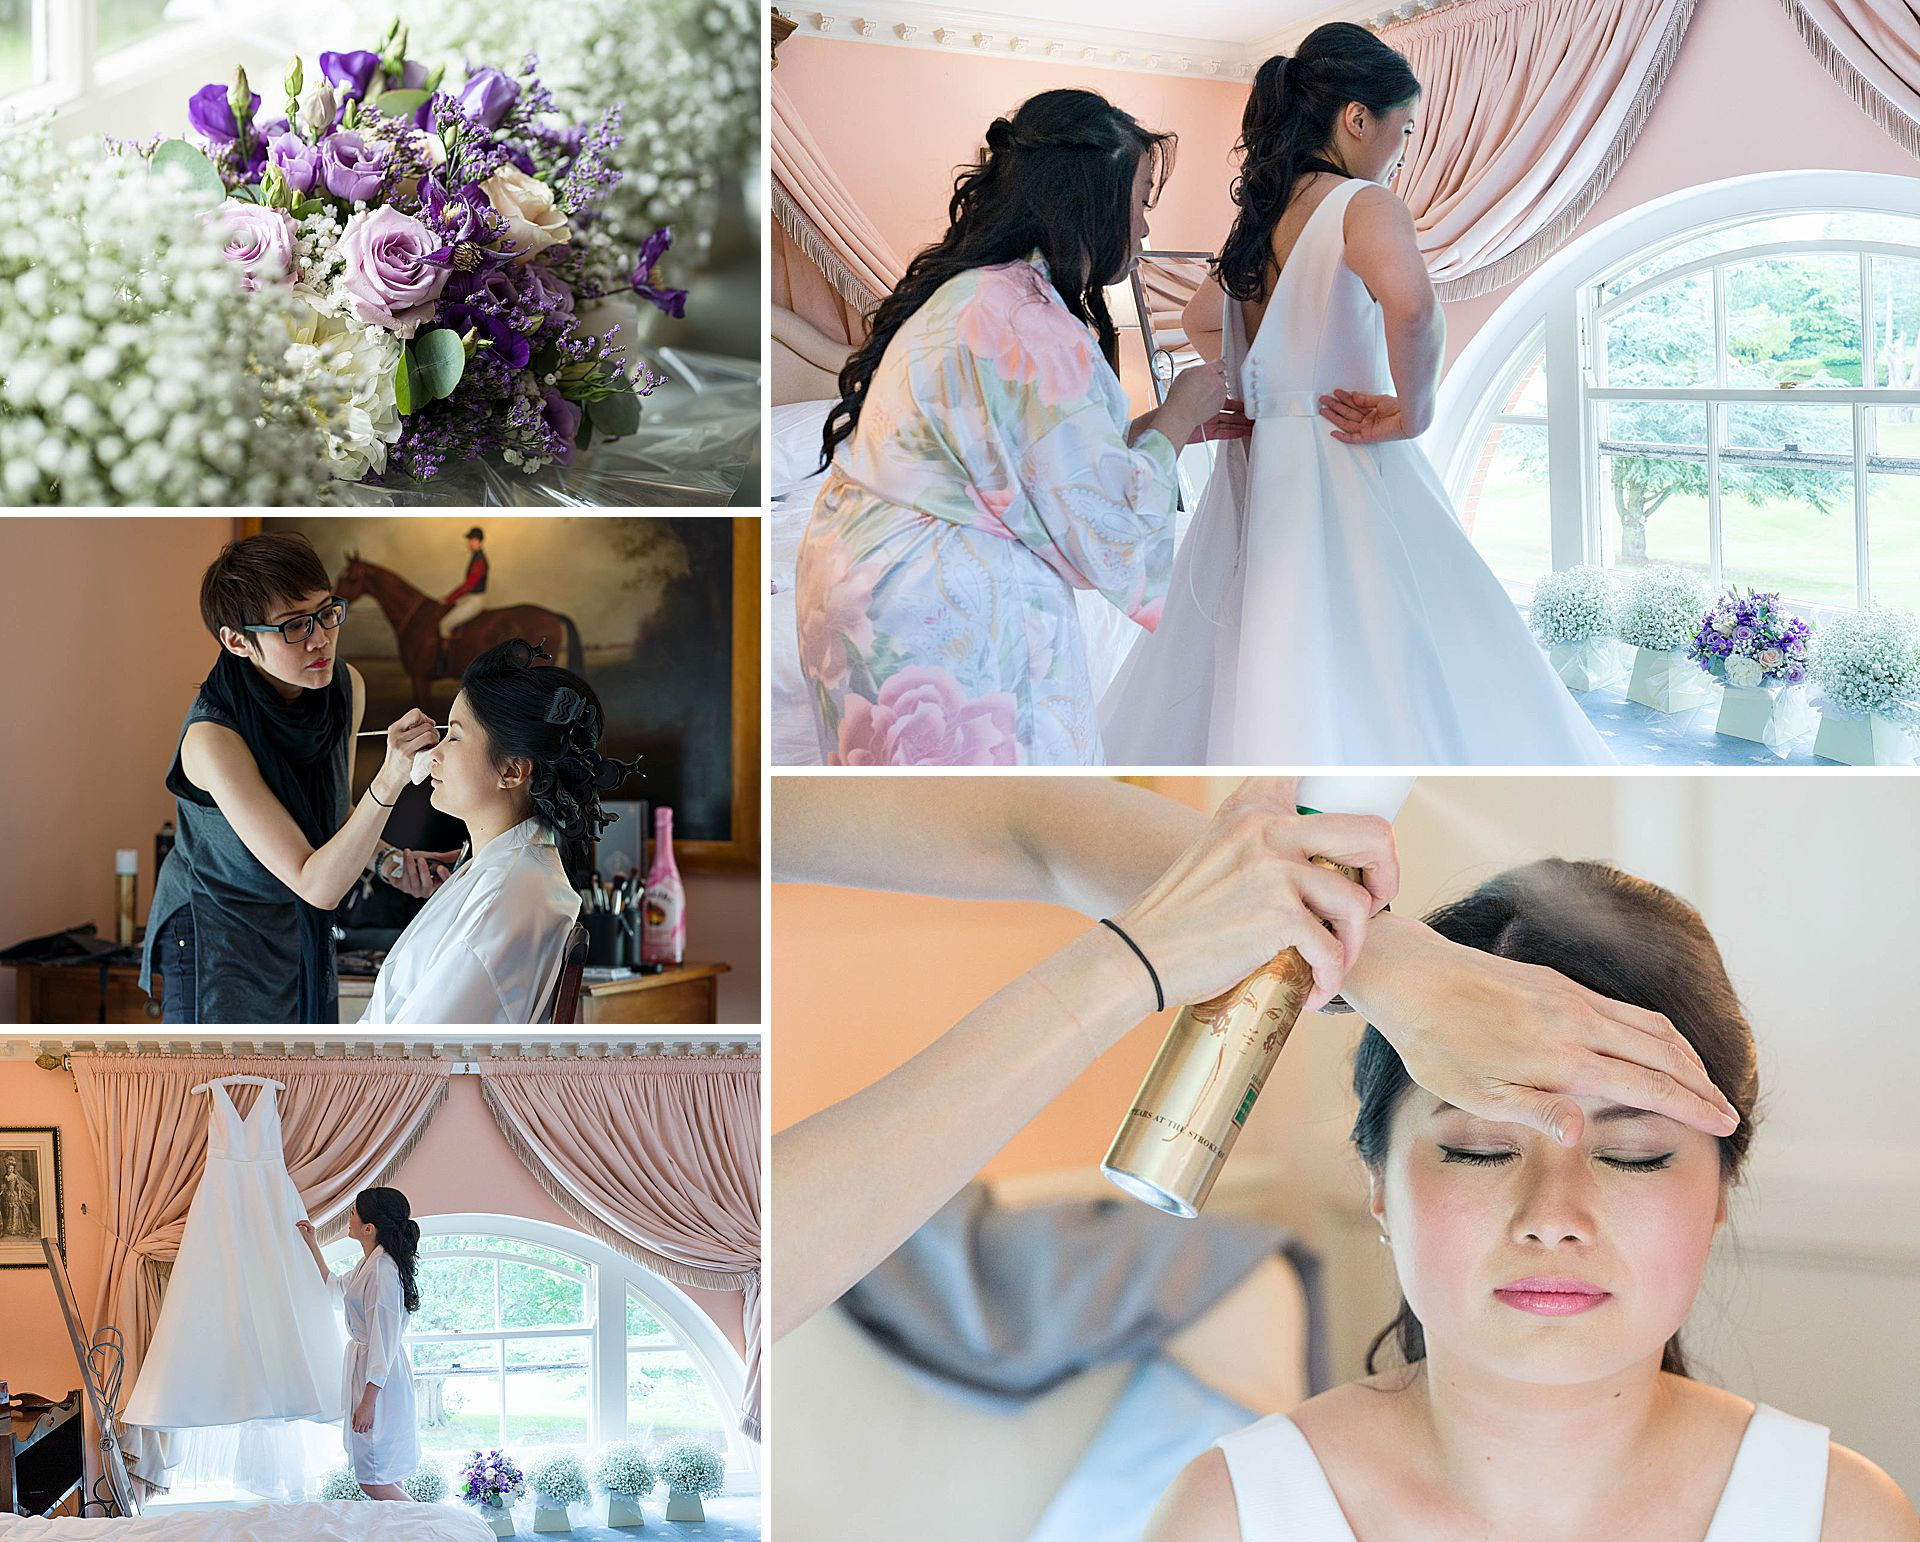 Brocket Hall Bridal Preparations